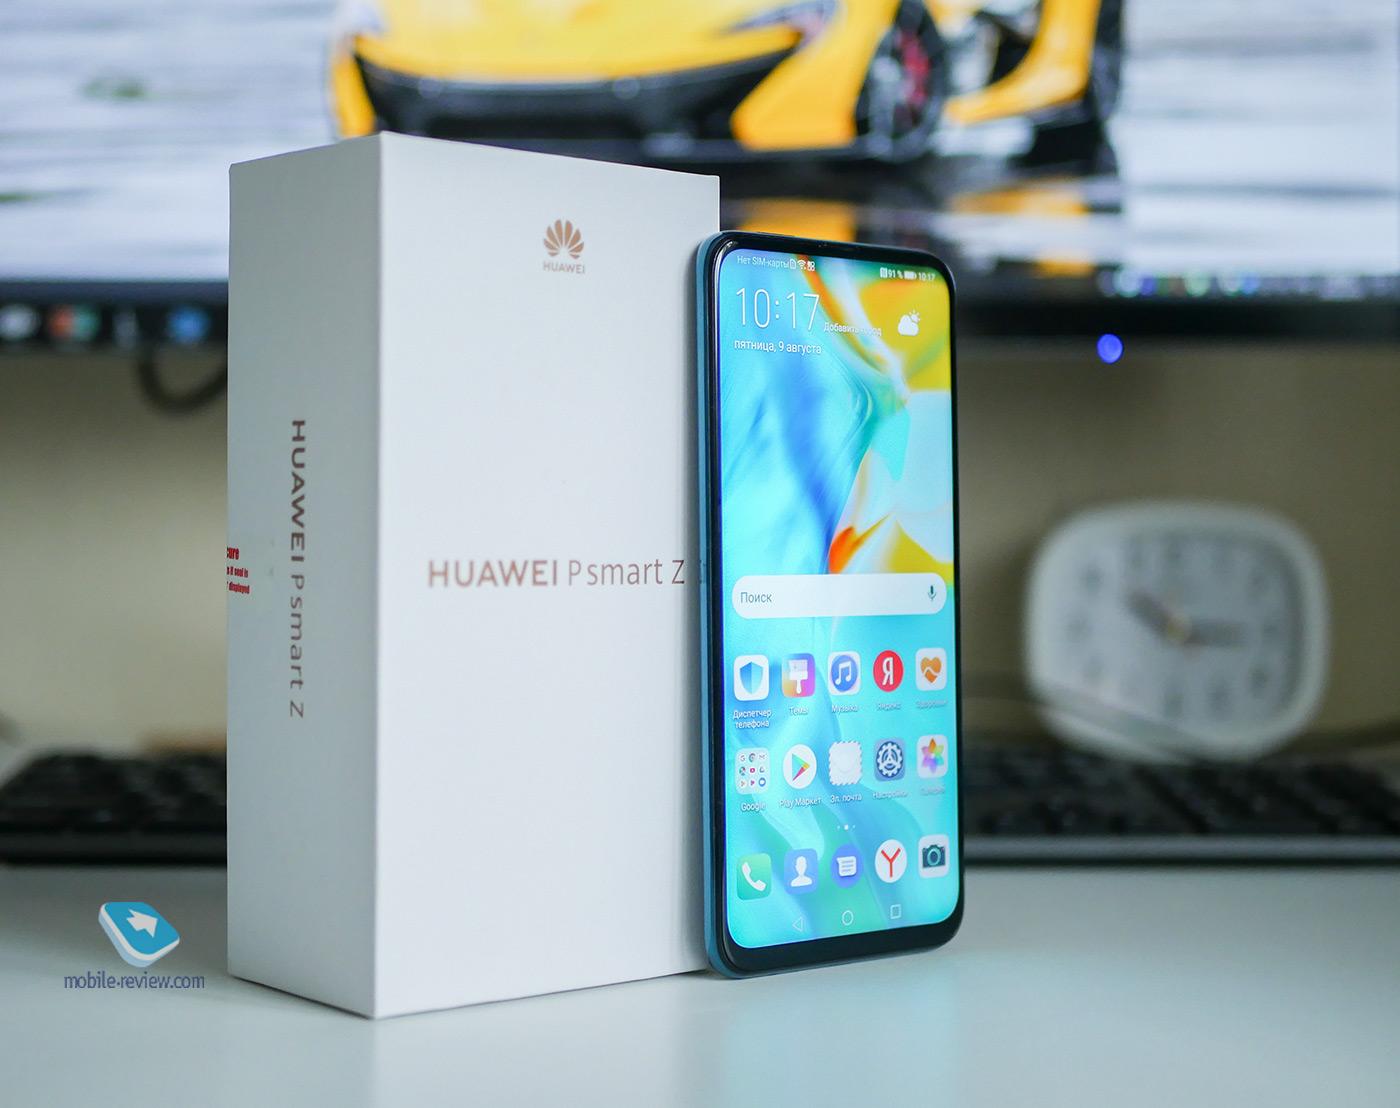 Mobile-review.com Обзор <b>смартфона Huawei P smart</b> Z